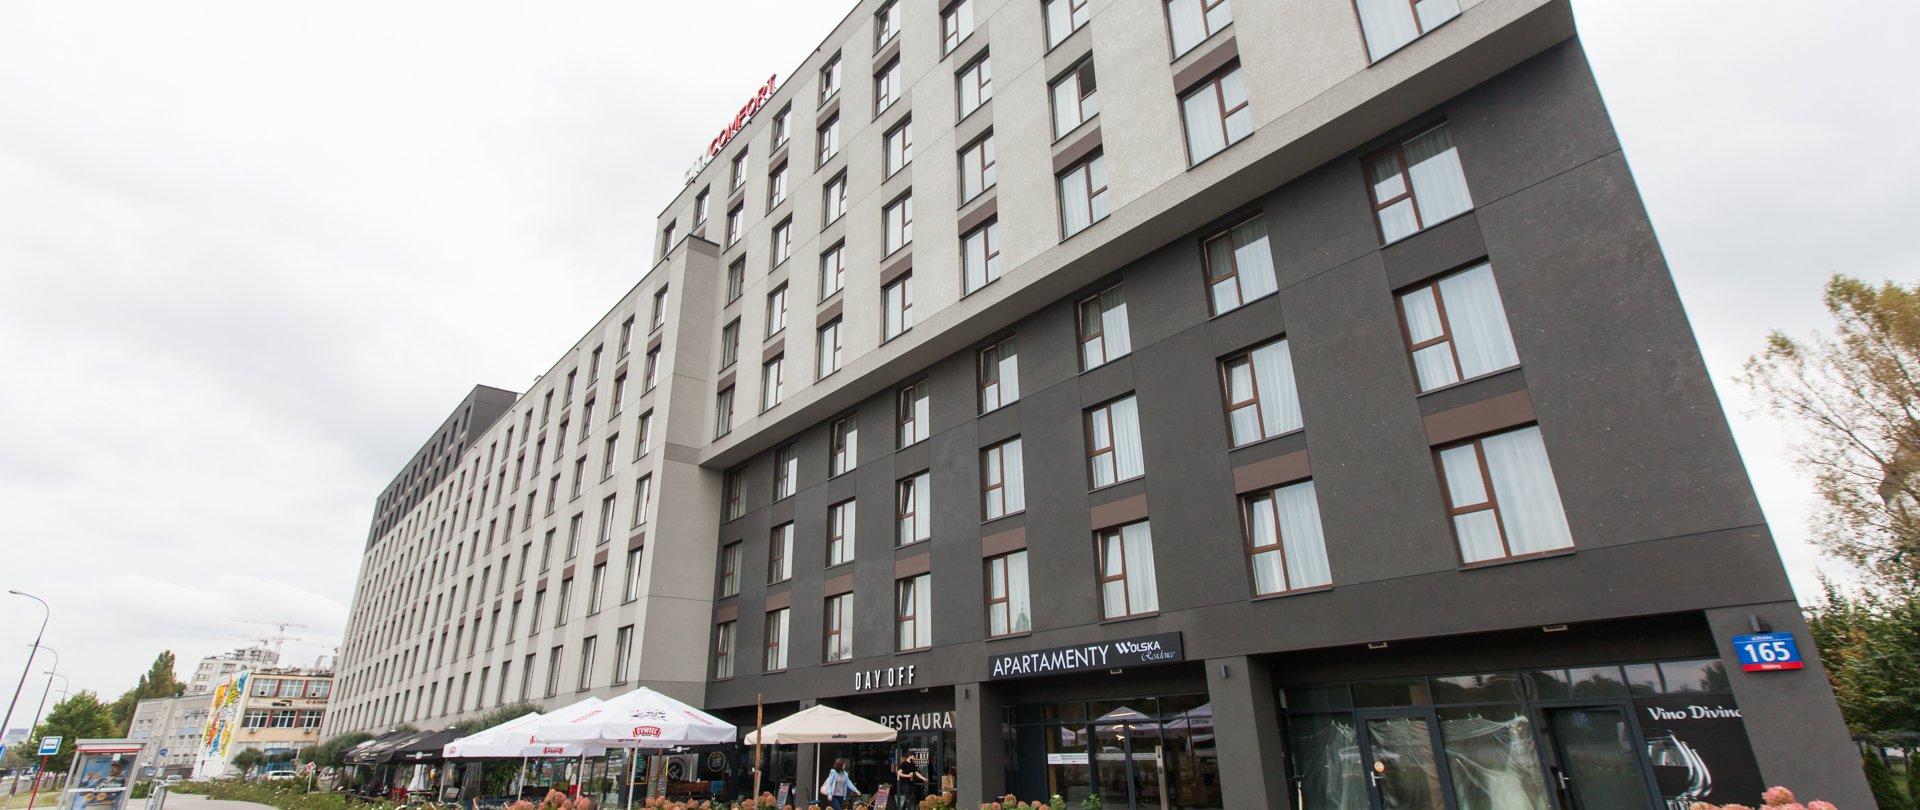 City Break Aparthotels, Gdańsk